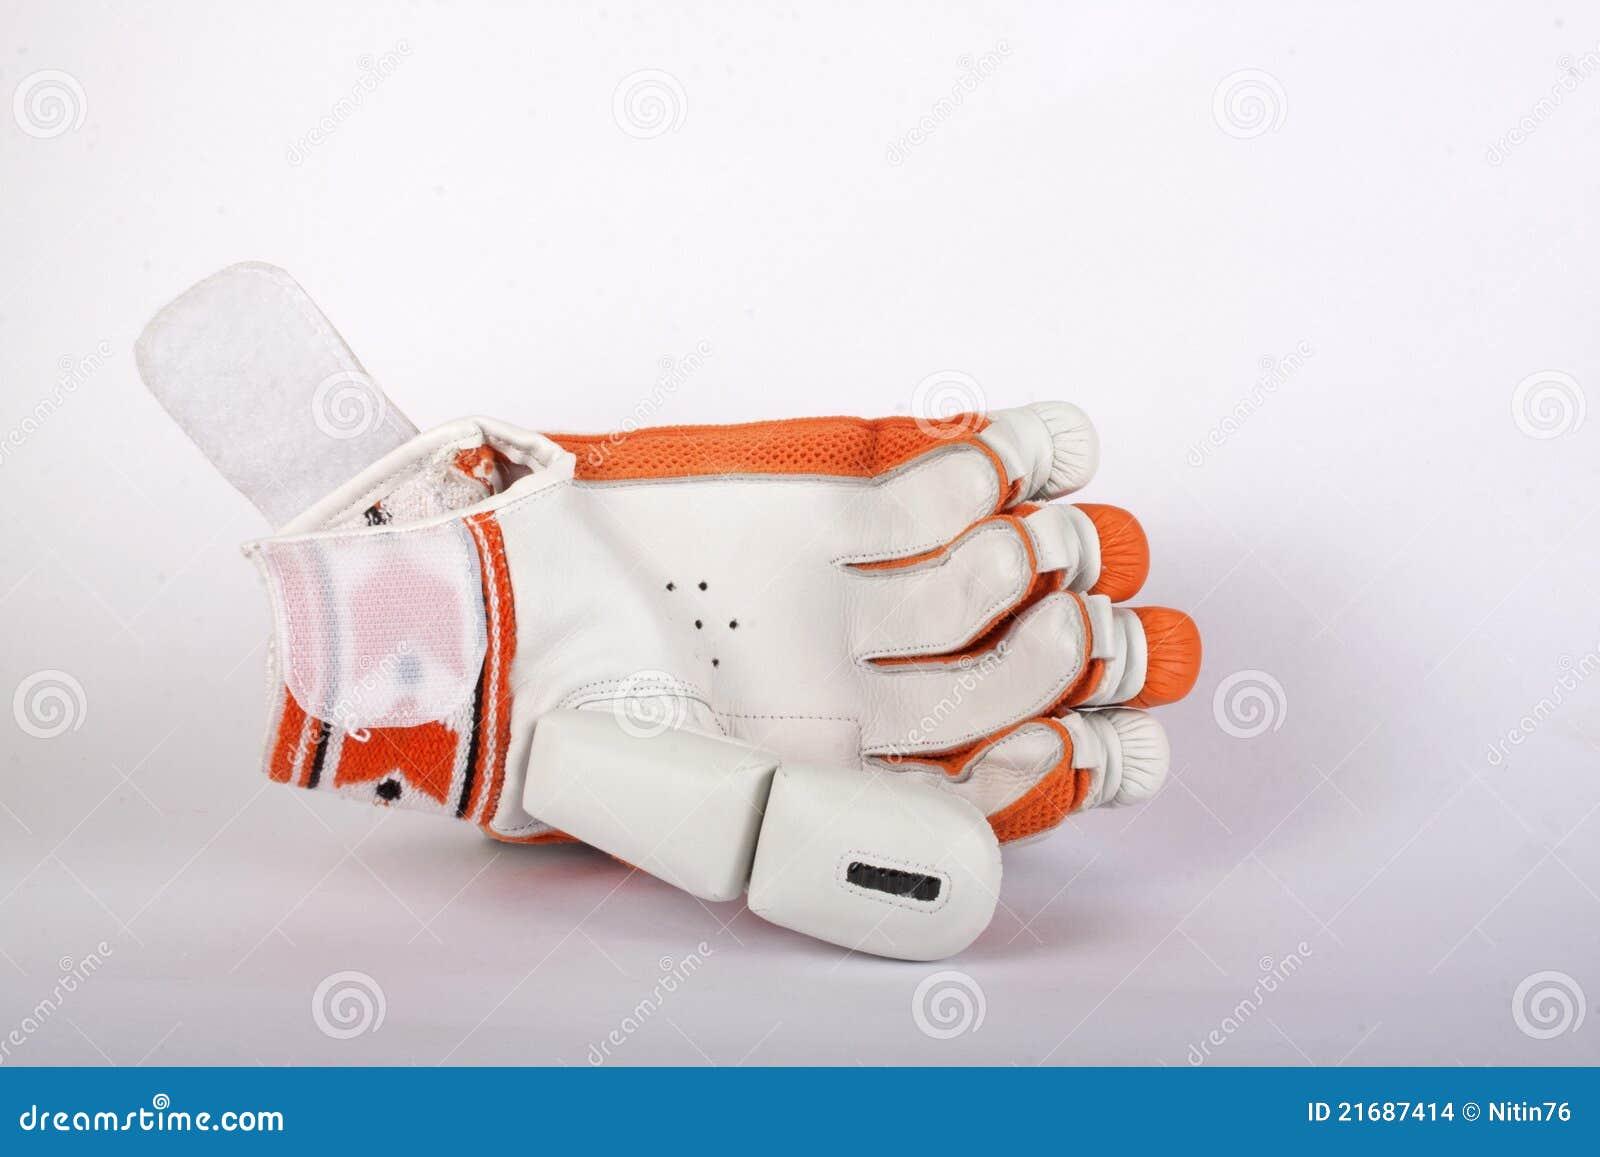 Cricket Gloves for Batsman